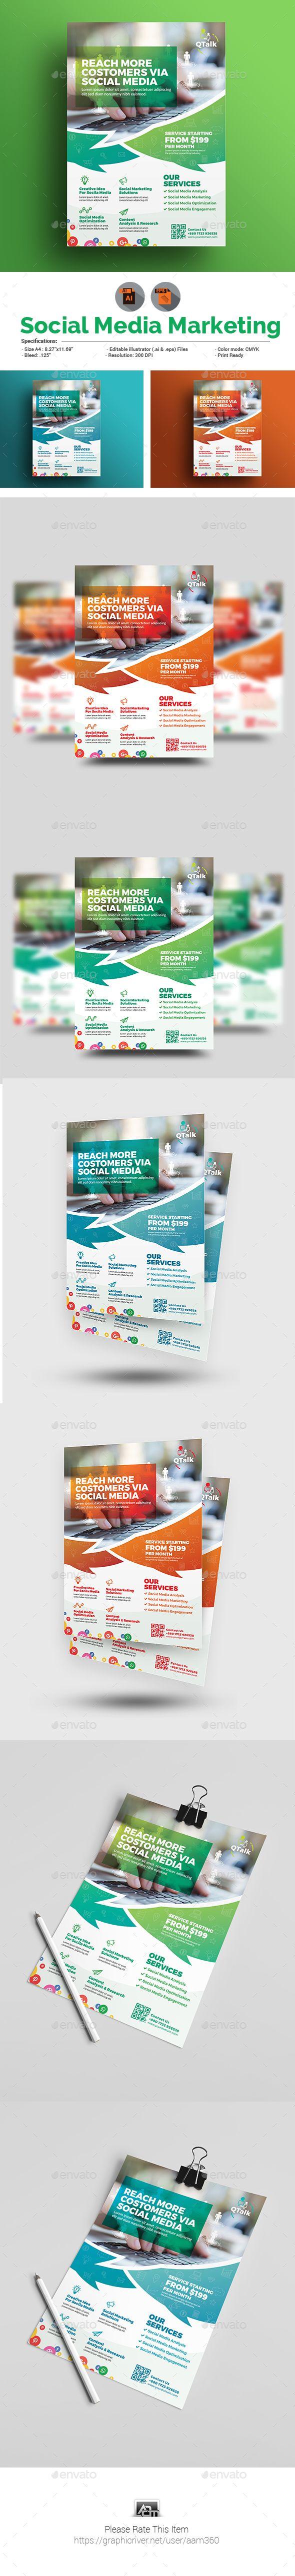 Social Media Marketing Flyer Template Vector EPS, AI Illustrator